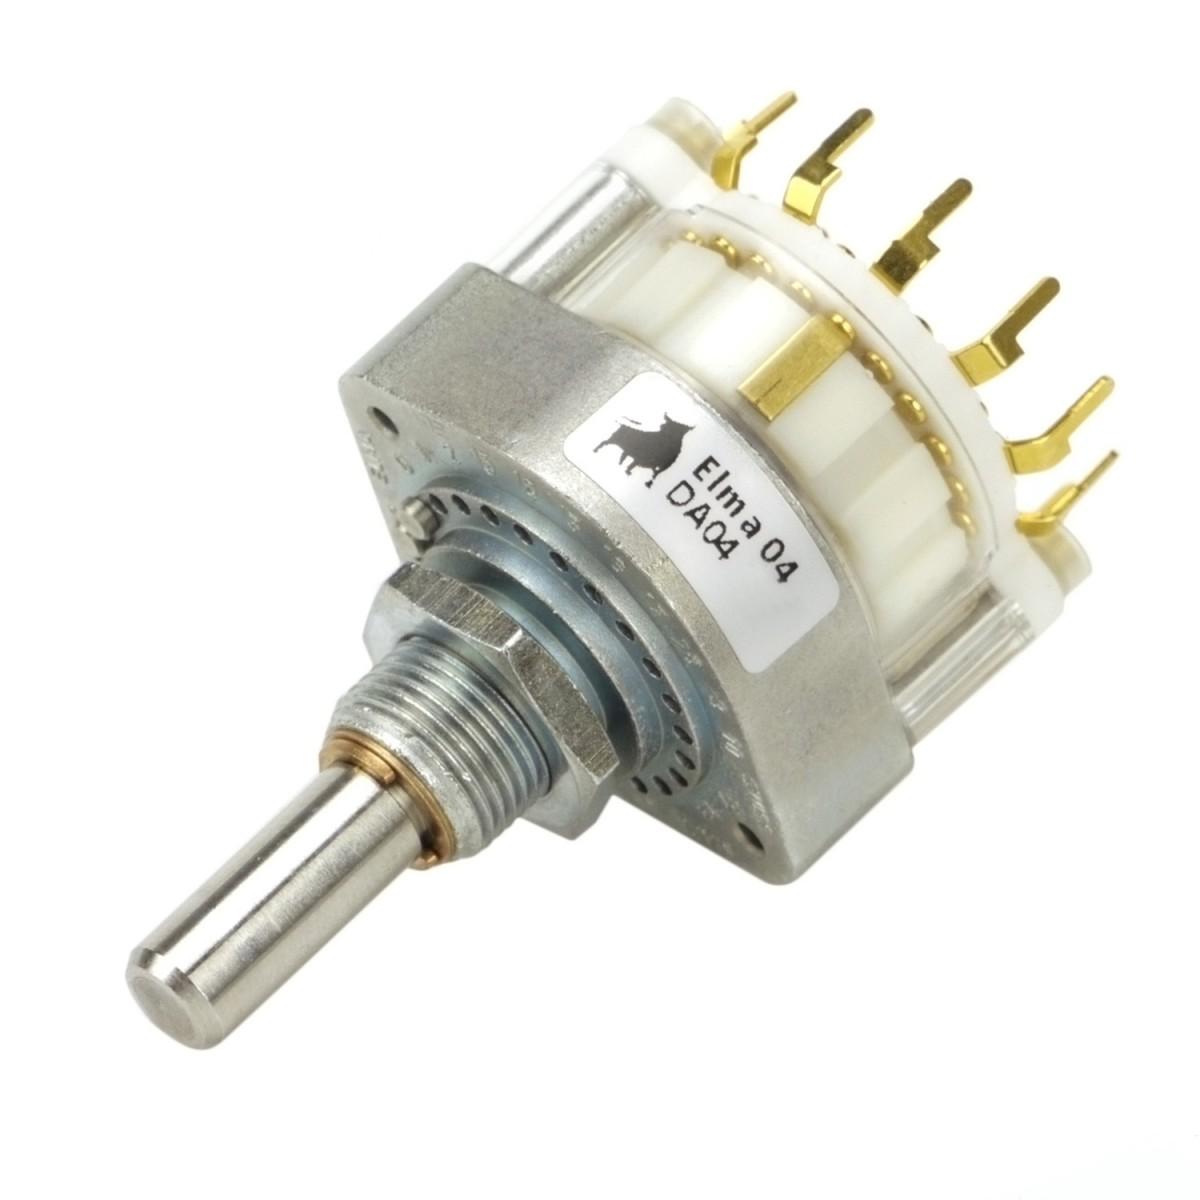 Elma Rotary switch Type 04, 33,15 €